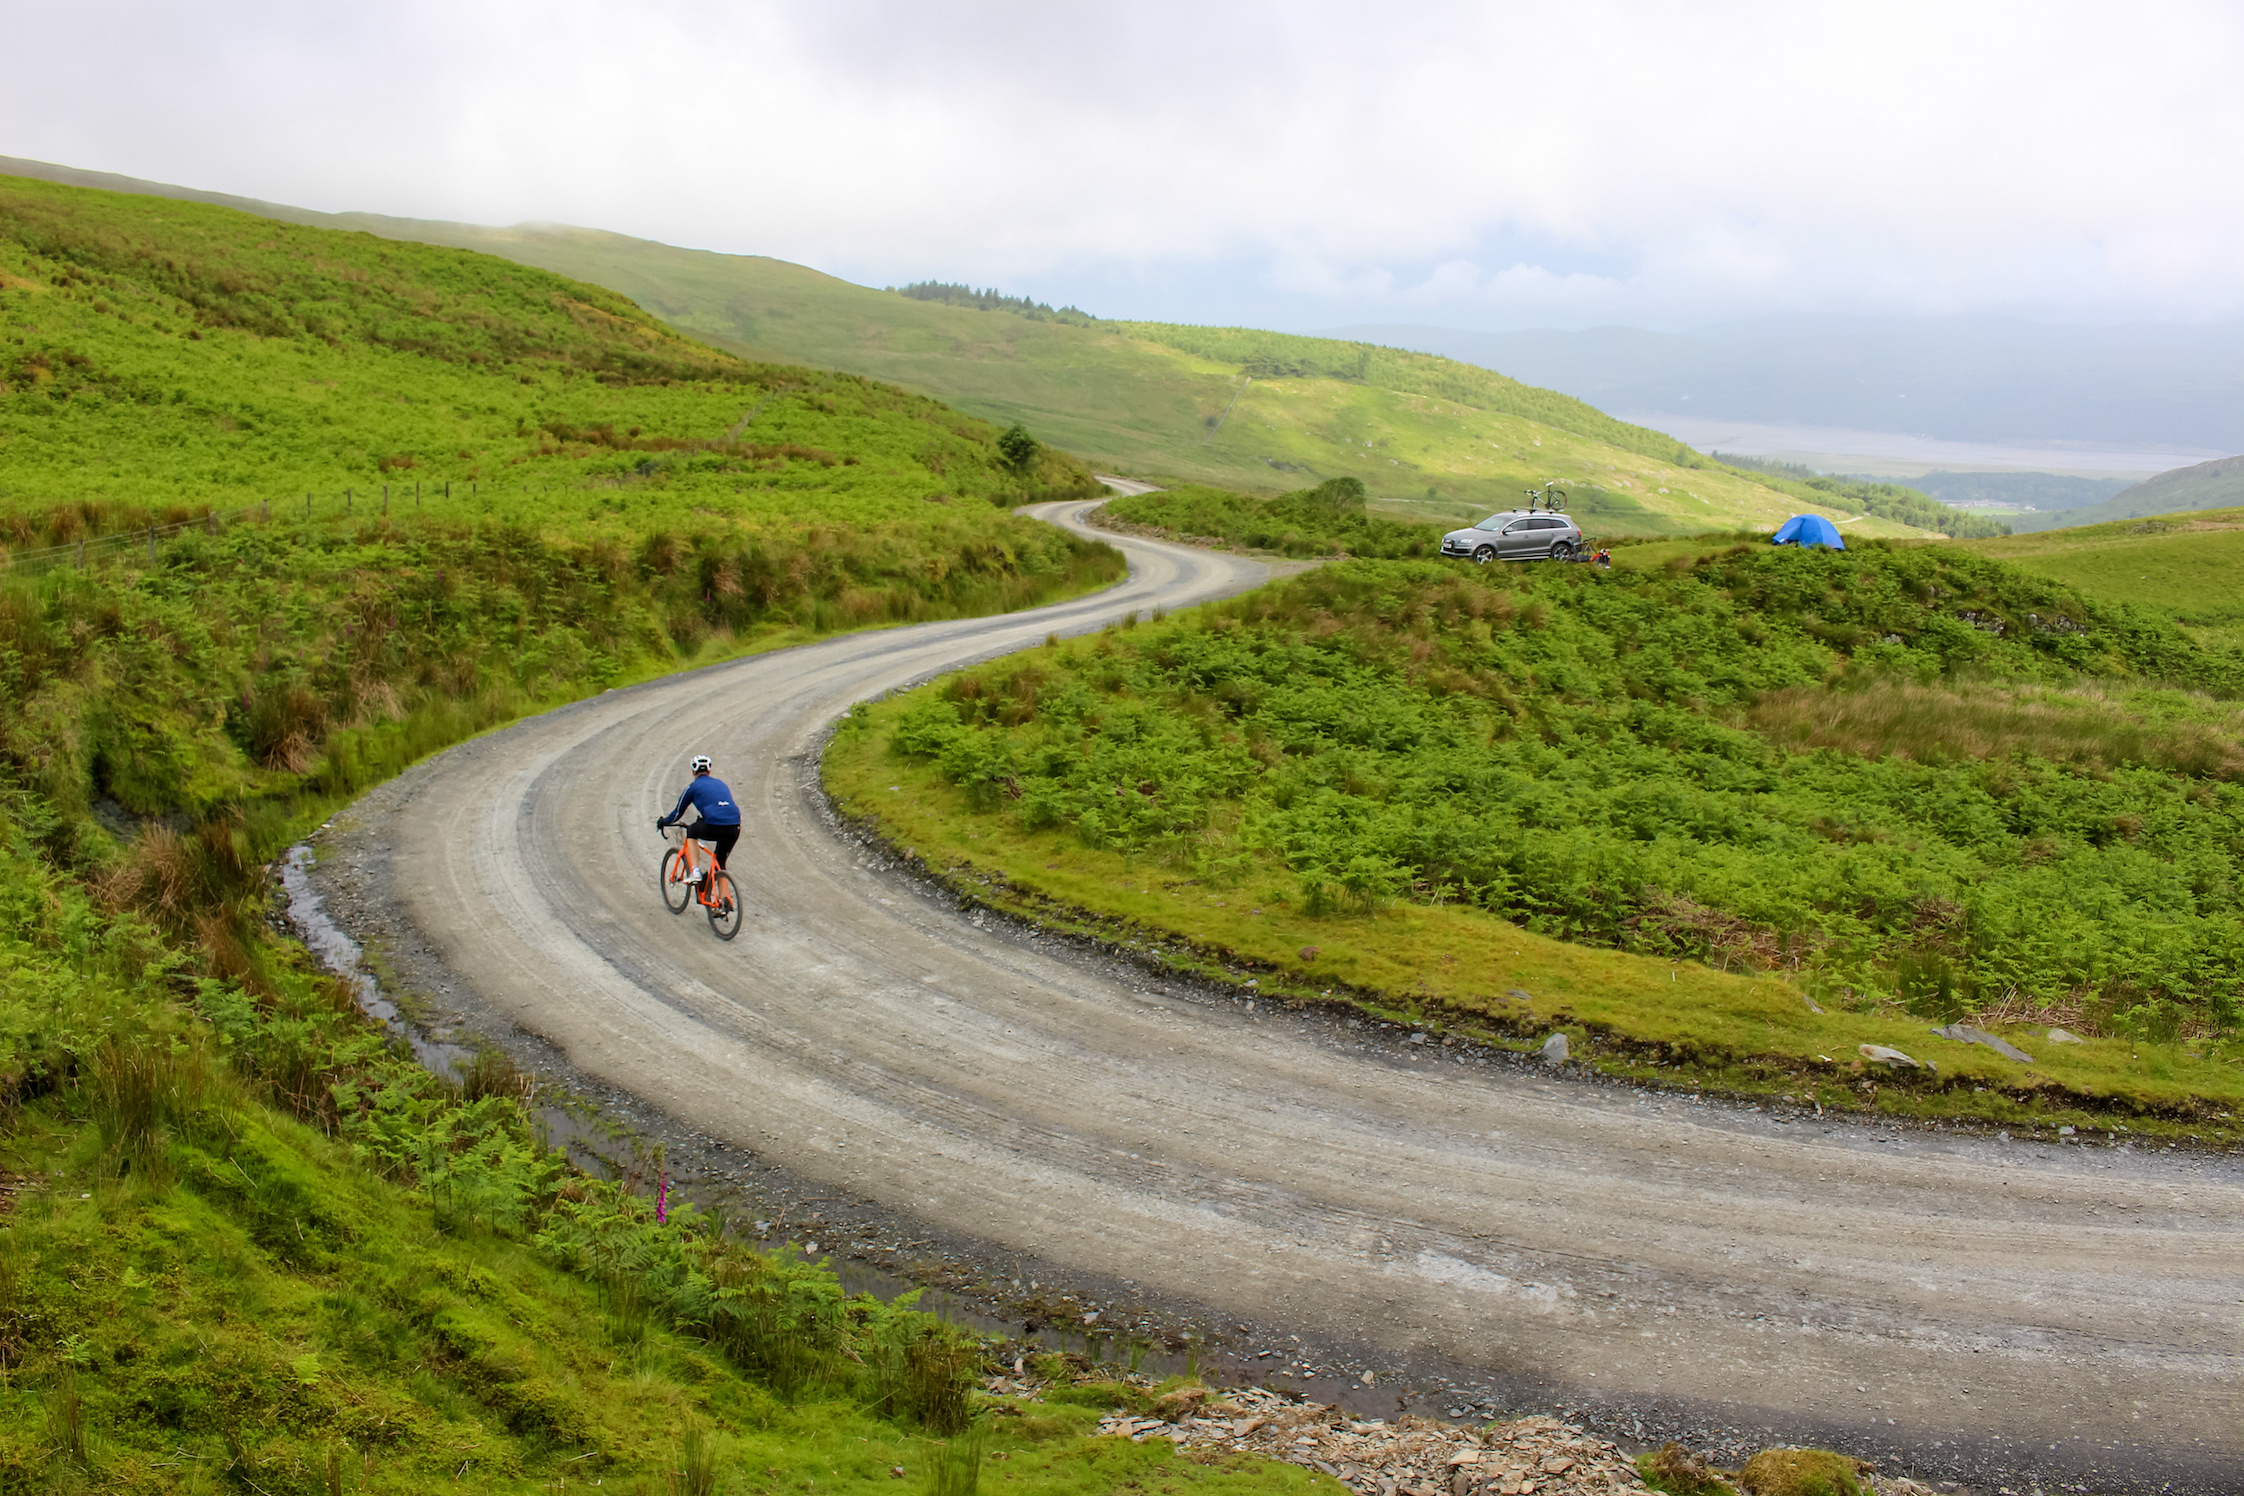 Everesting #3 – Off-Road: Mynydd Graean (Gravel Mountain)